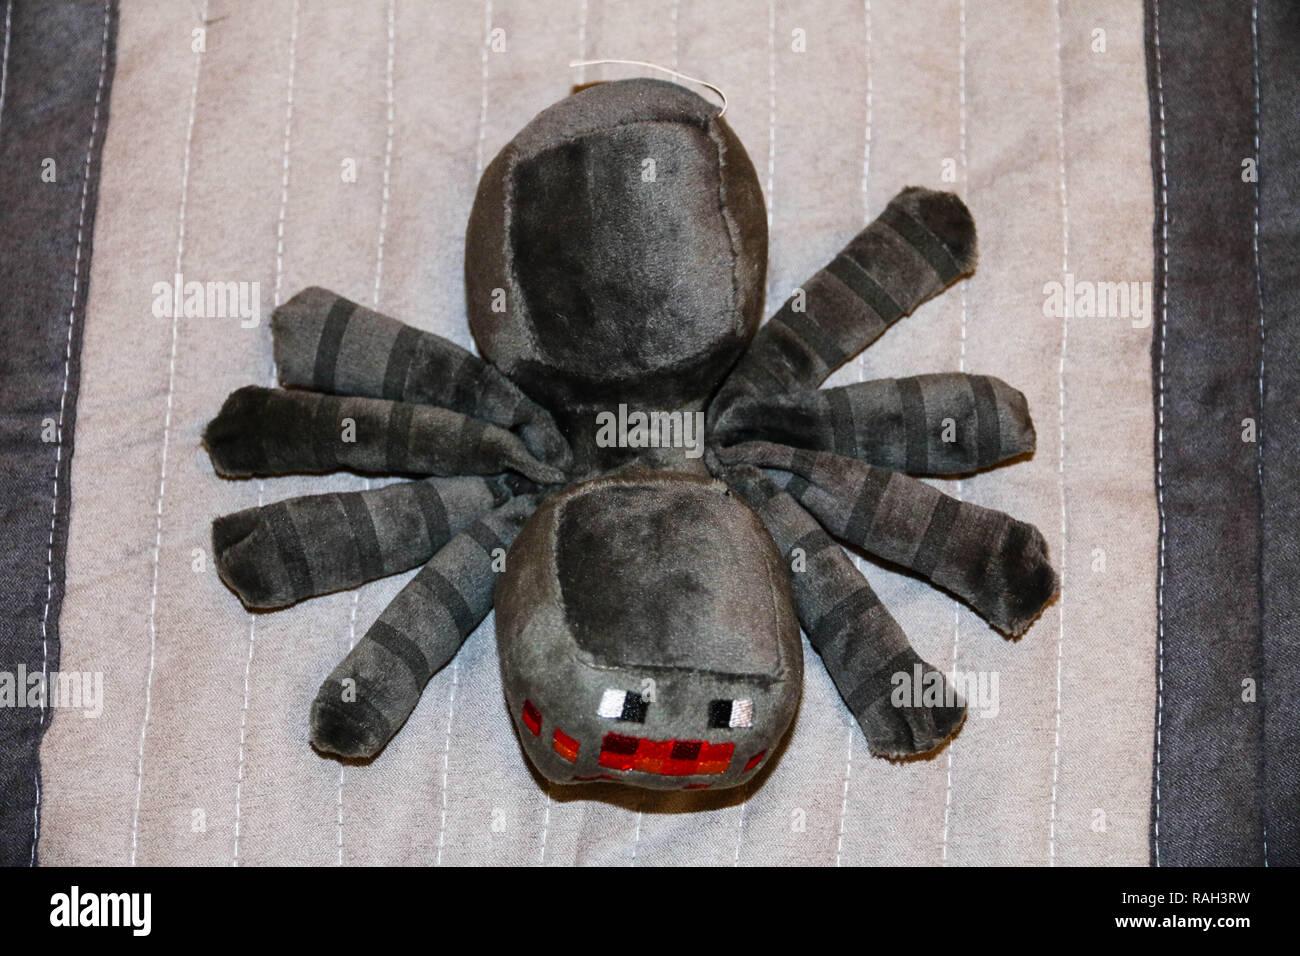 Minecraft spider plush - Stock Image